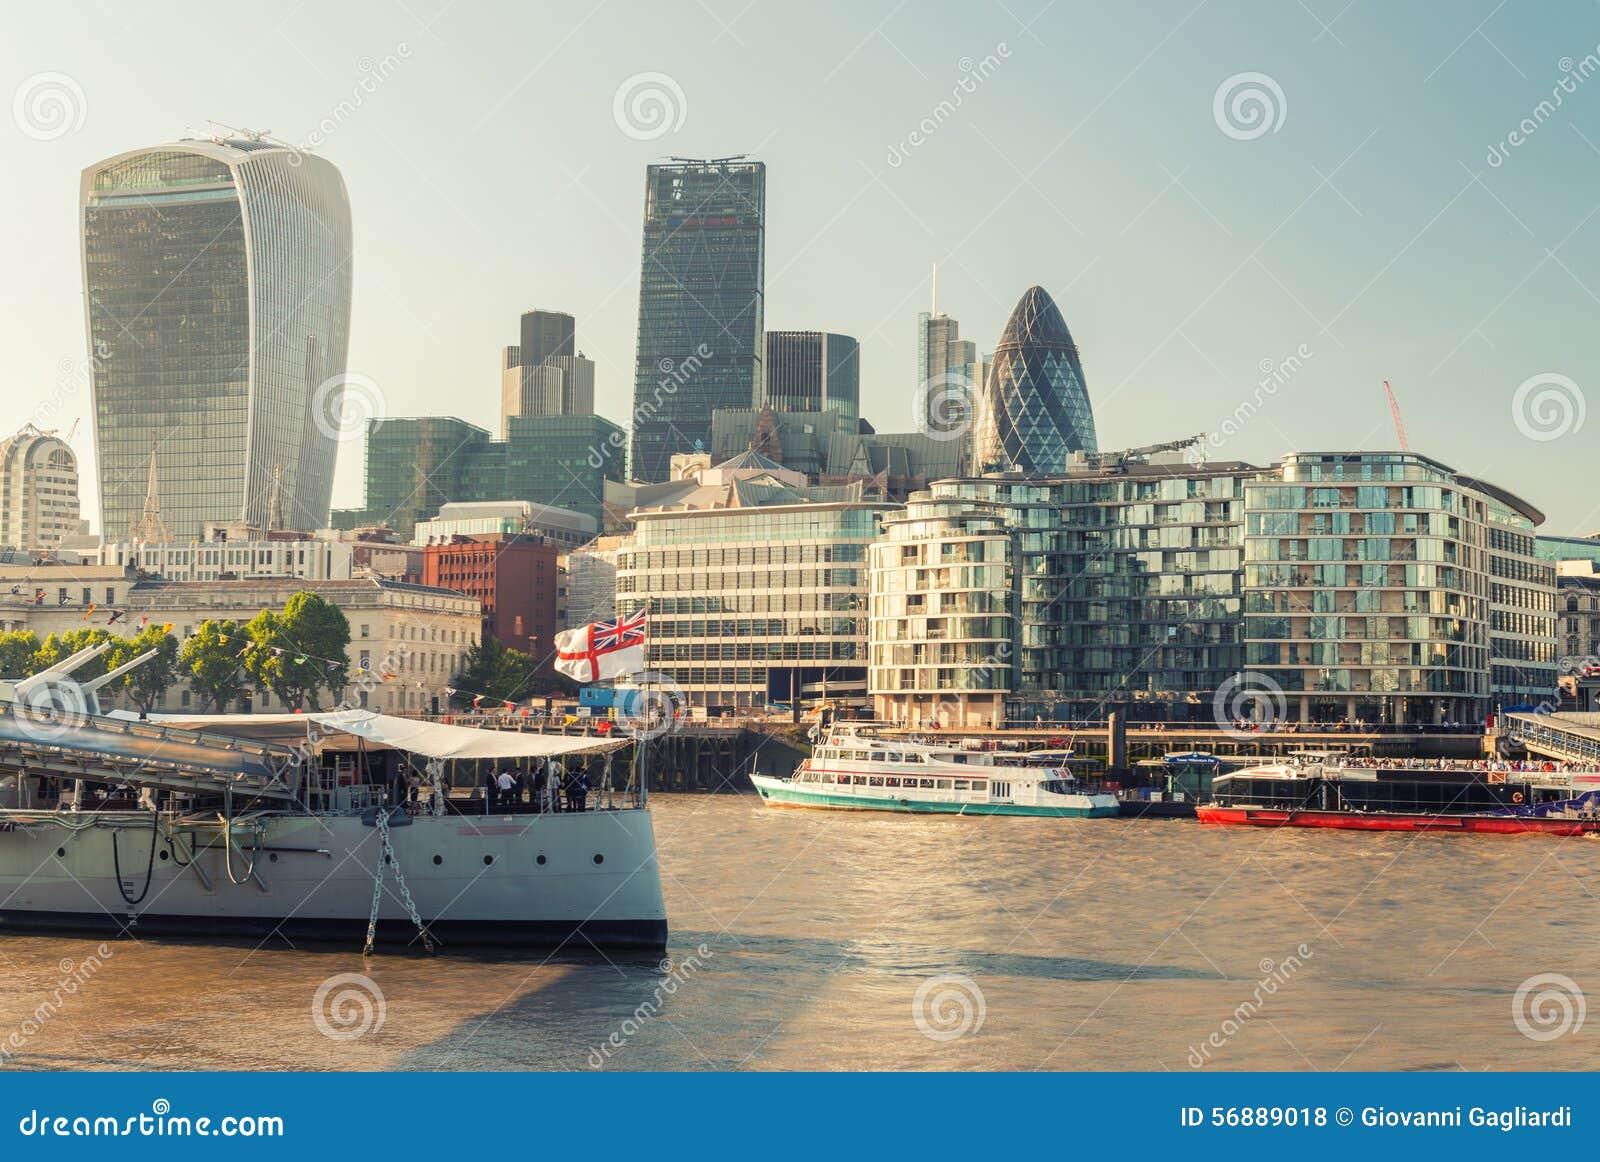 Bella vista della città di Londra dal Tamigi